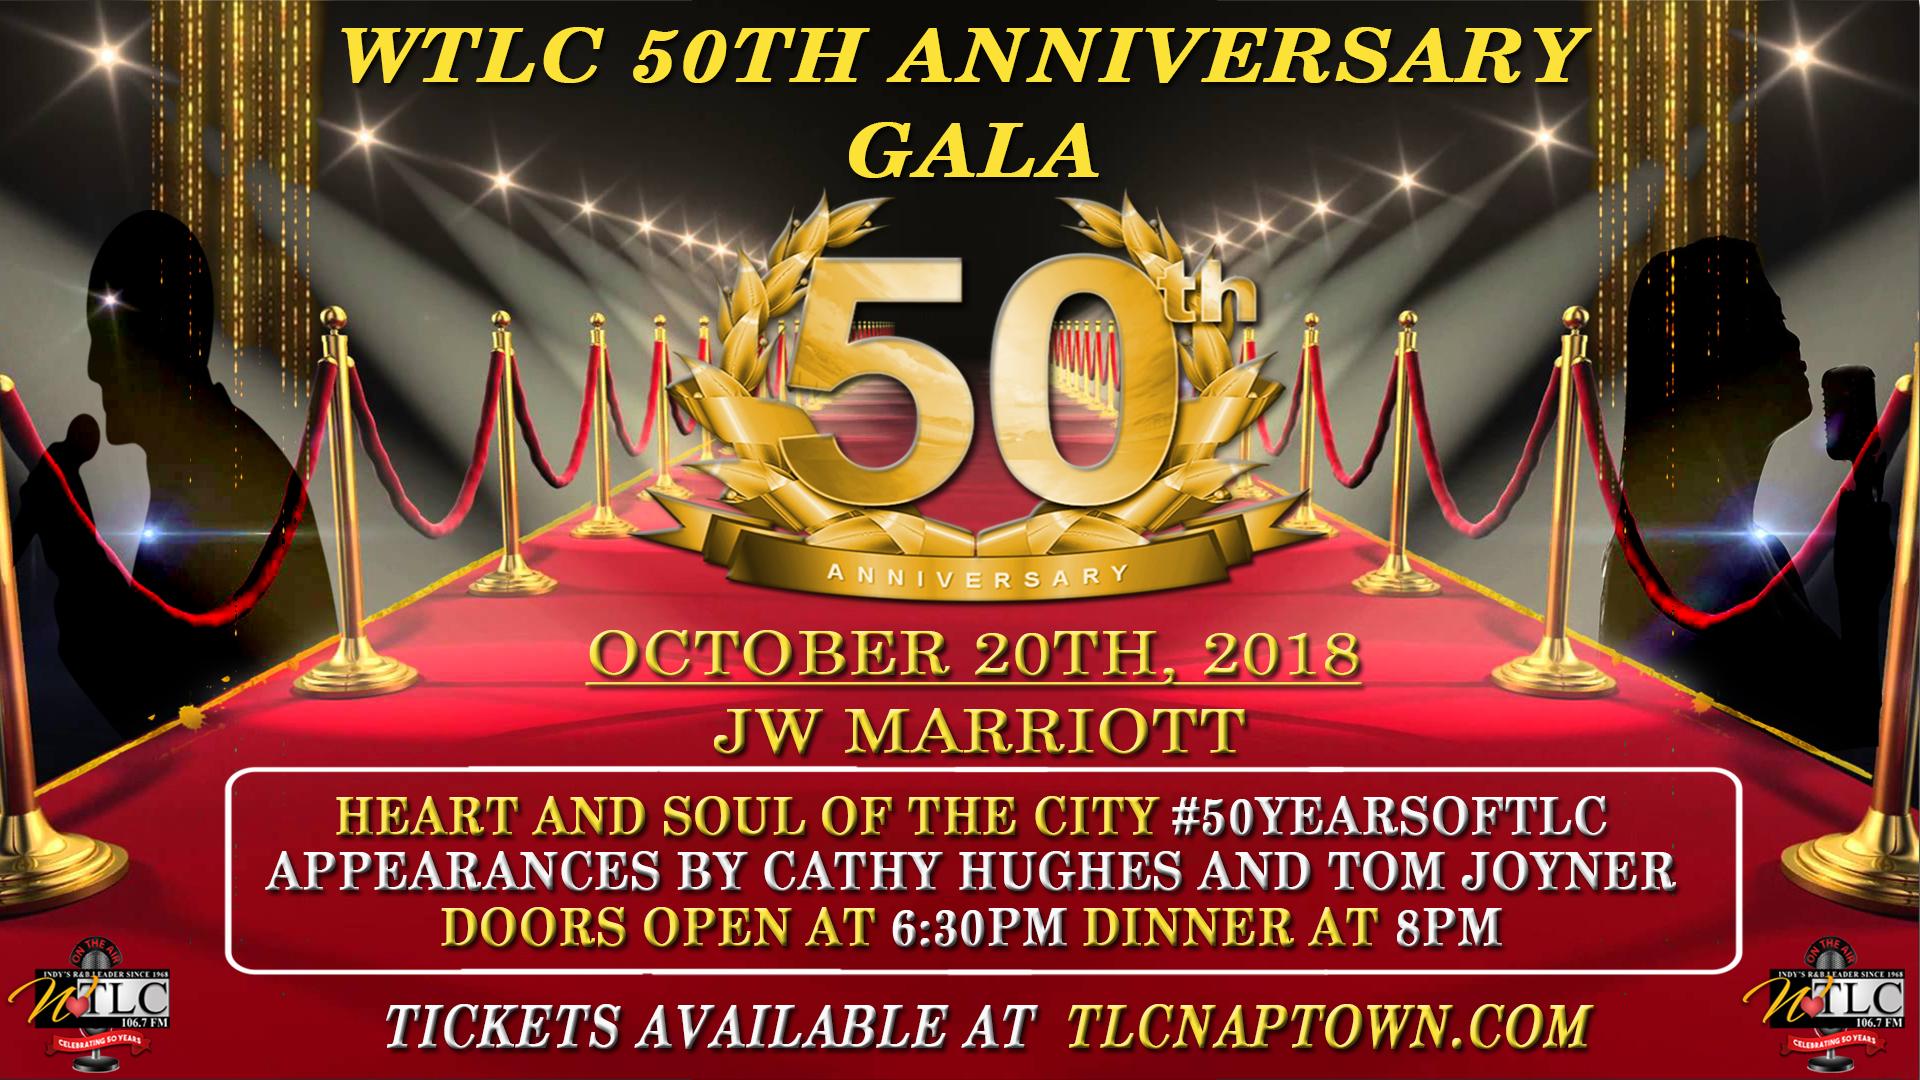 WTLC 50th Anniversary Gala Flyer